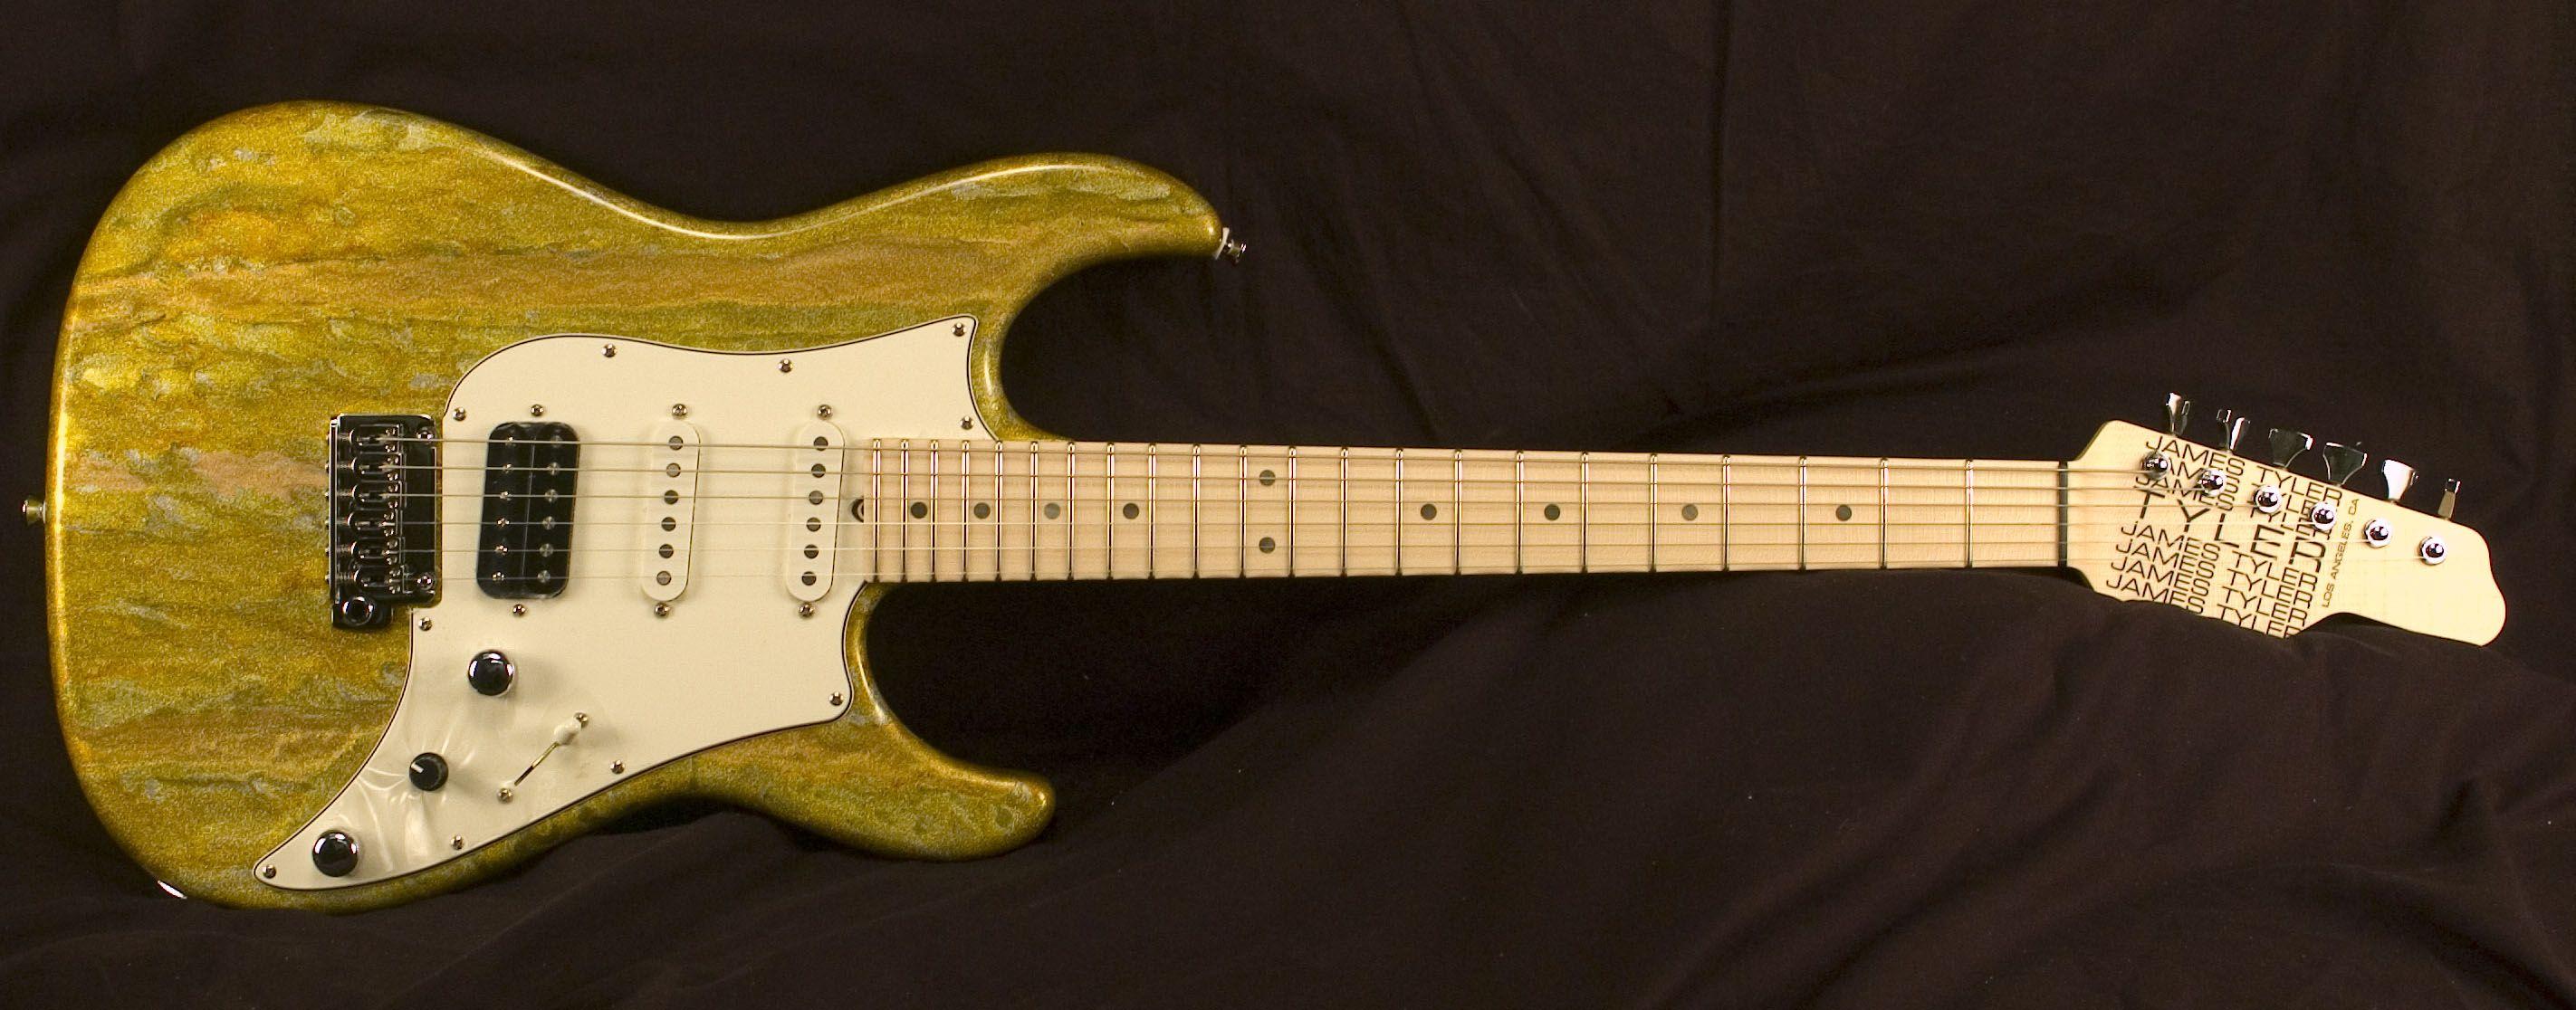 james tyler guitars studio elite lemon schmear guitar guitar music instruments. Black Bedroom Furniture Sets. Home Design Ideas